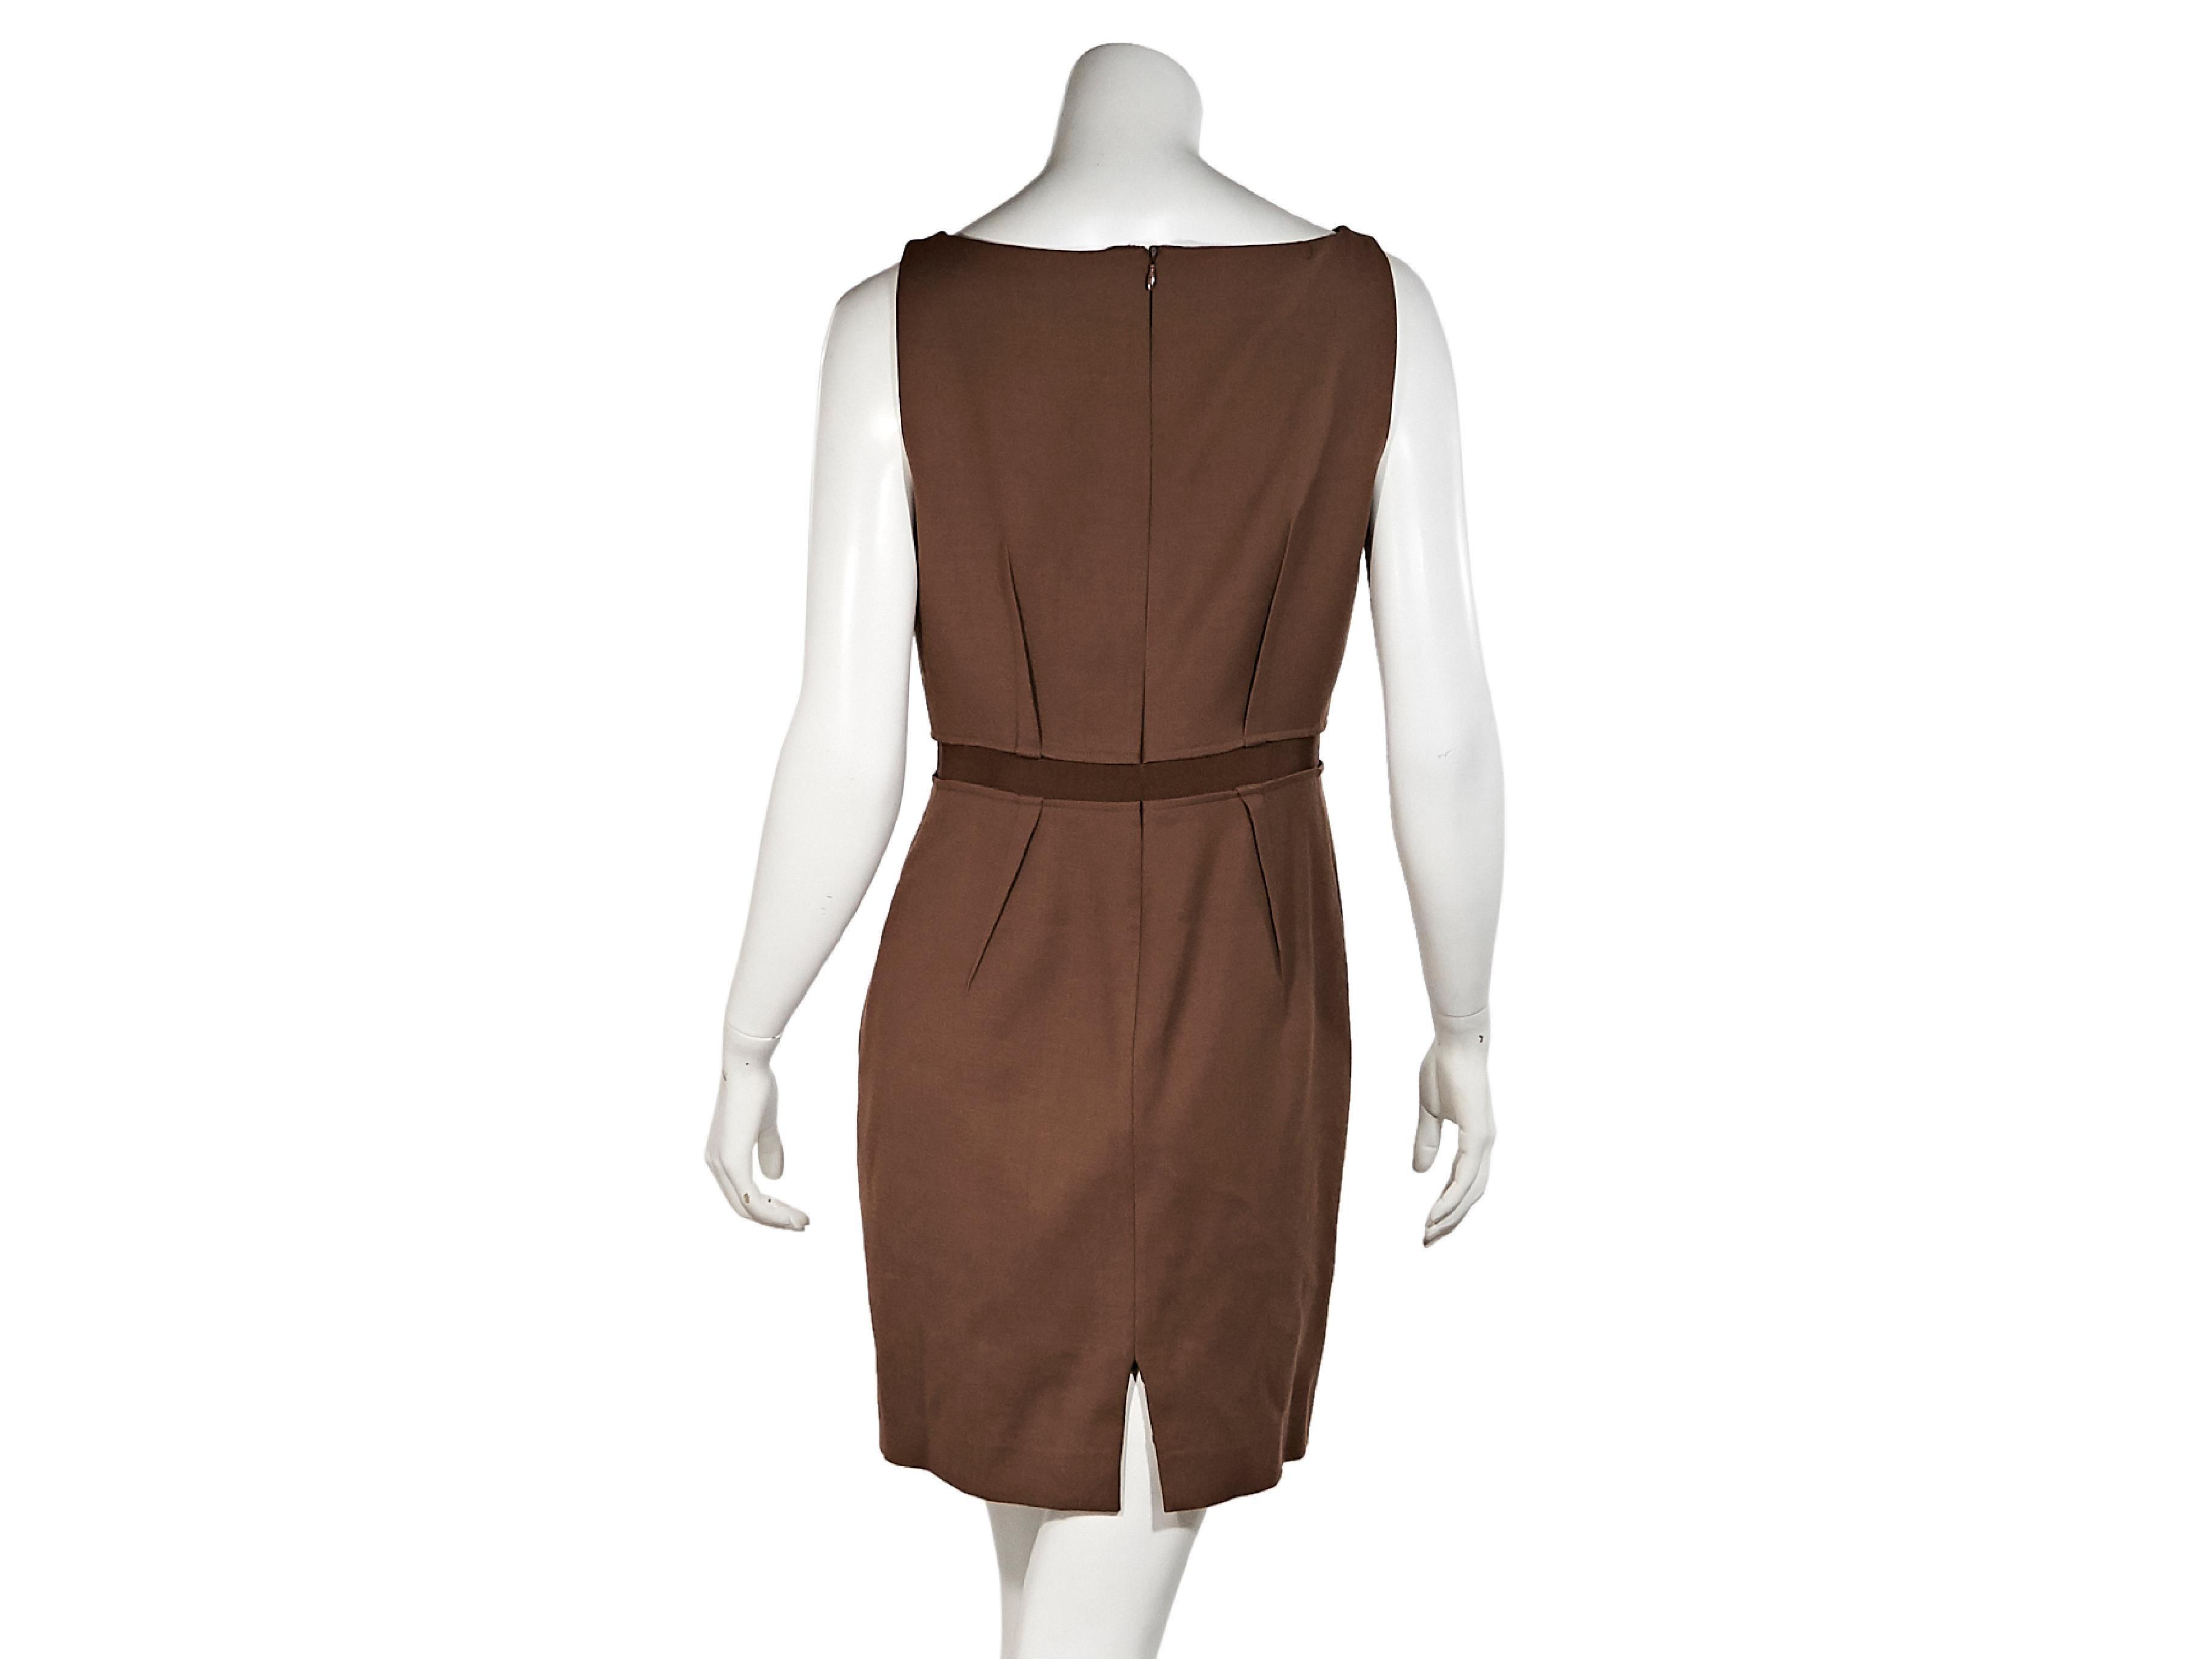 52692db4c5afe4 Brown Giambattista Valli Sleeveless Wool Dress For Sale at 1stdibs